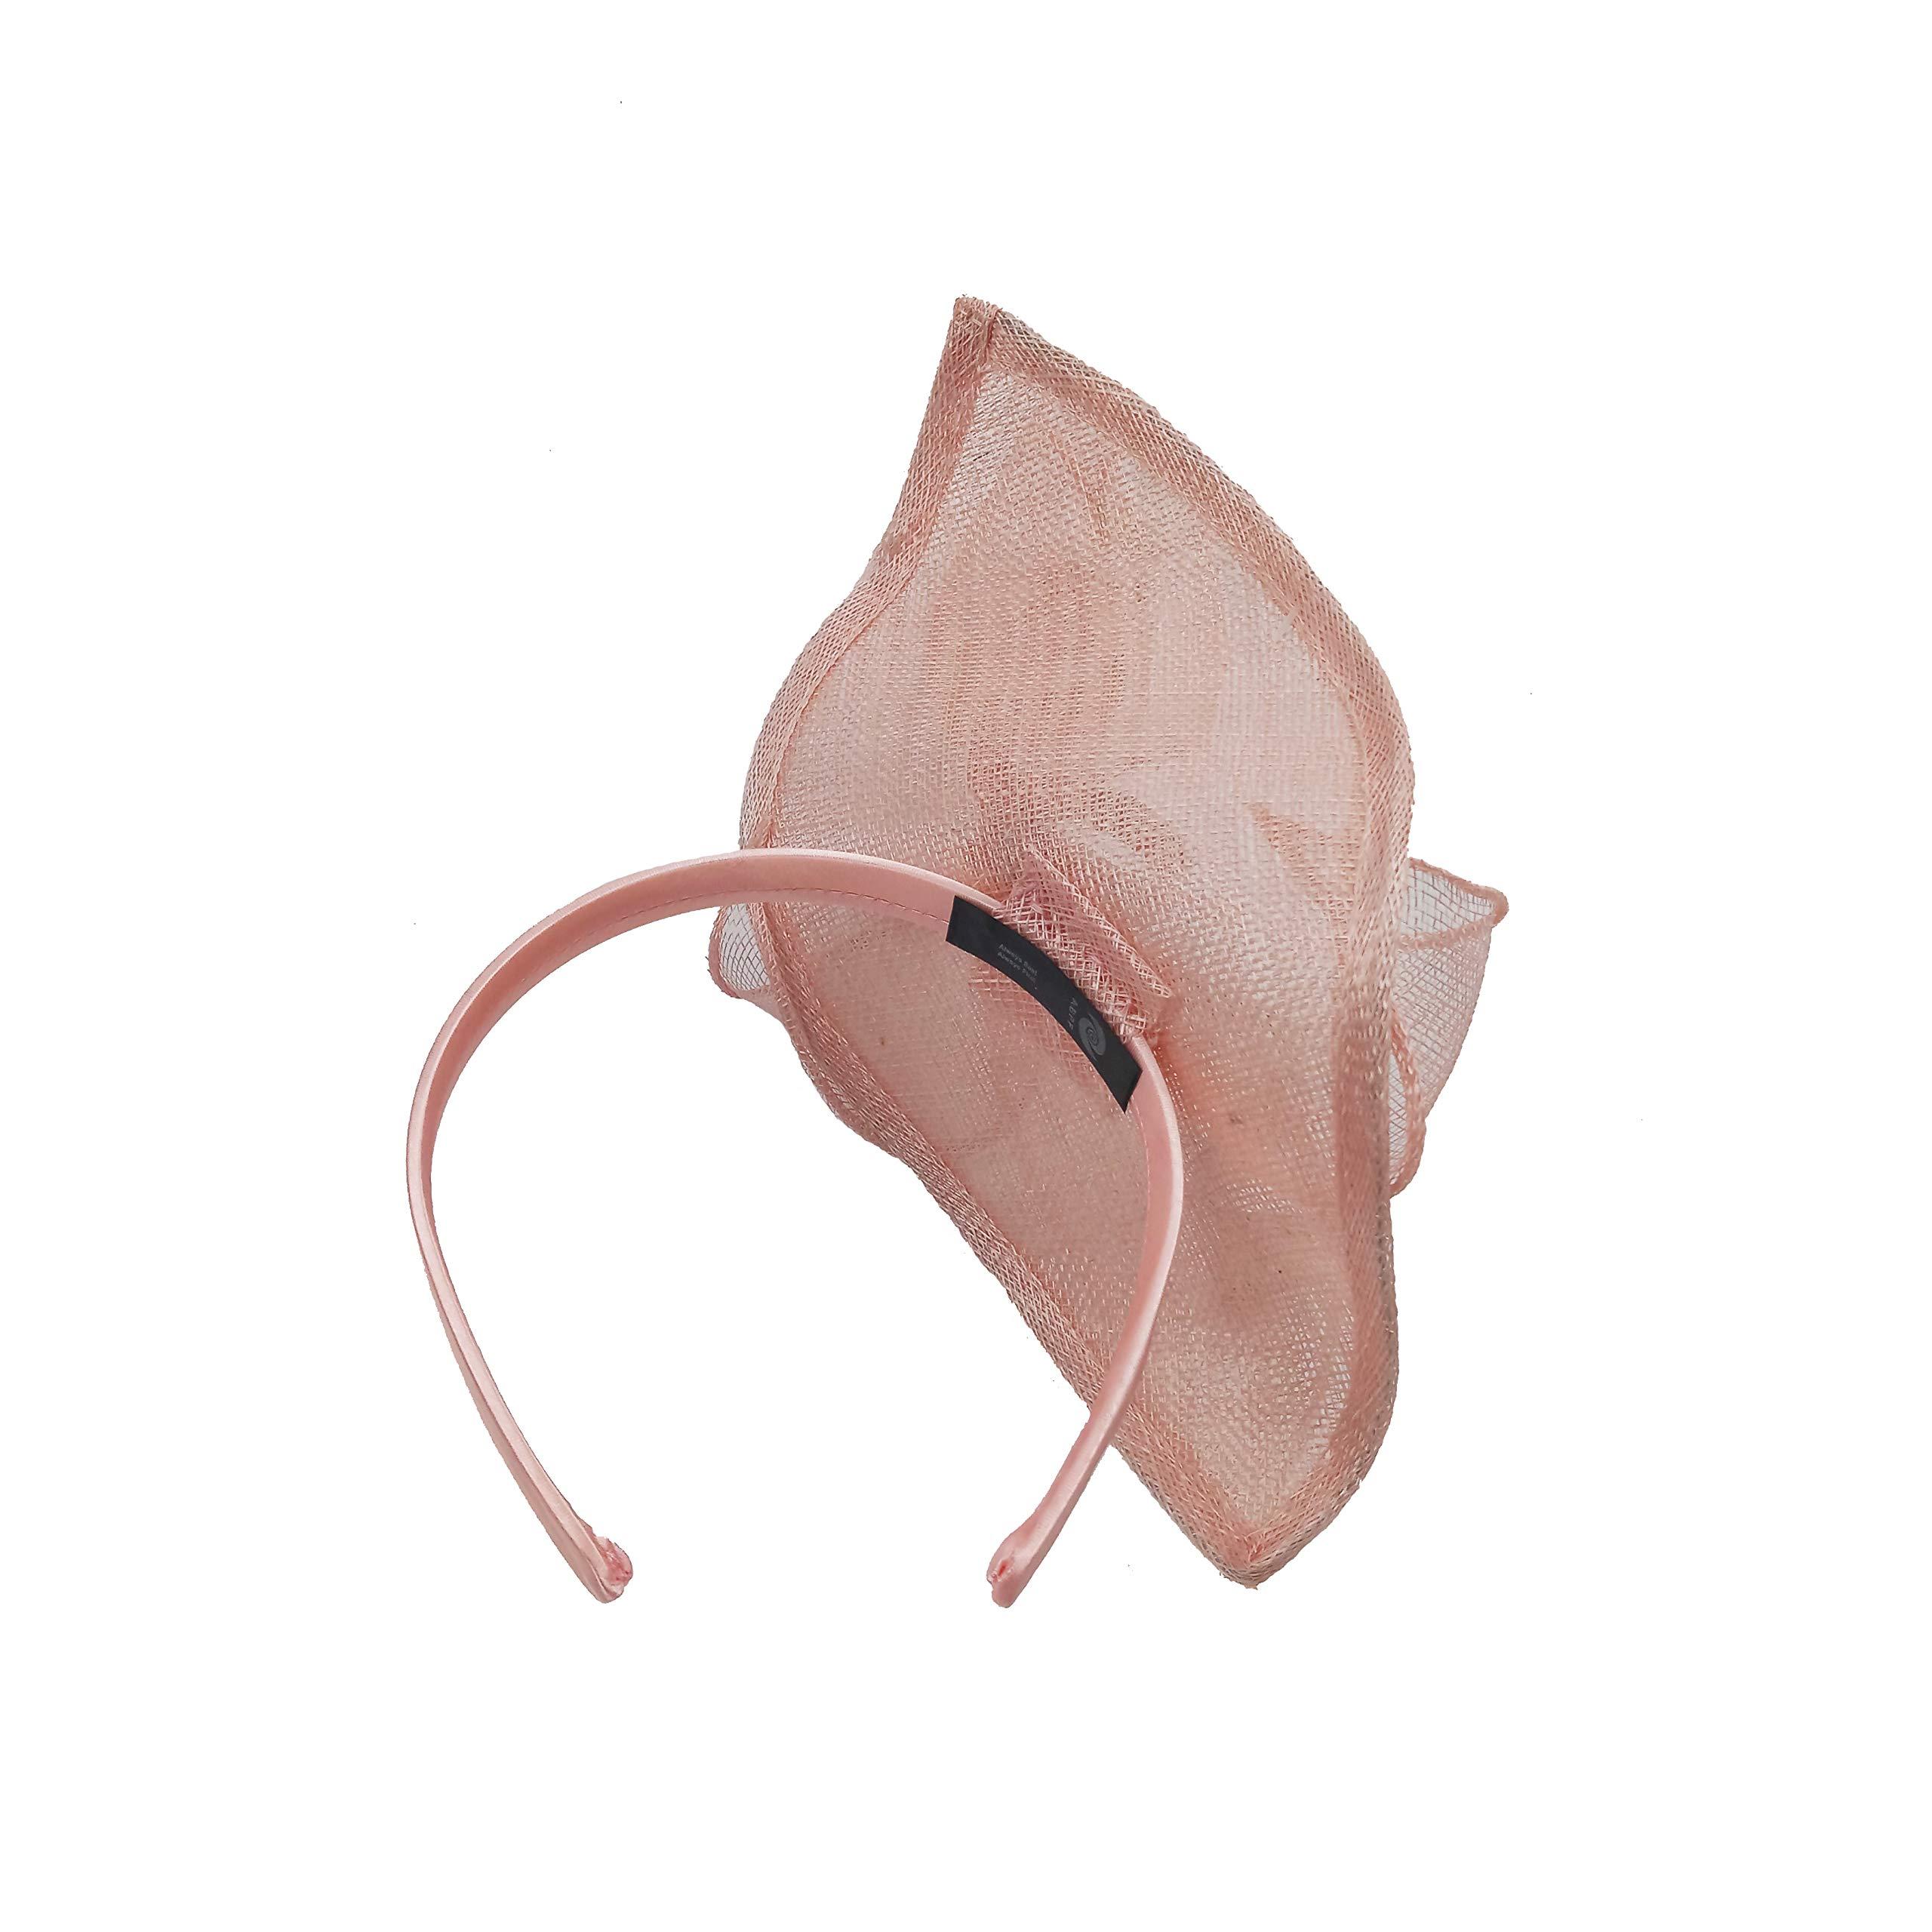 ABPF Sinamay Teardrop Fascinators Headband Hats Derby Racing Hat (Peach Pink) by ABPF (Image #4)